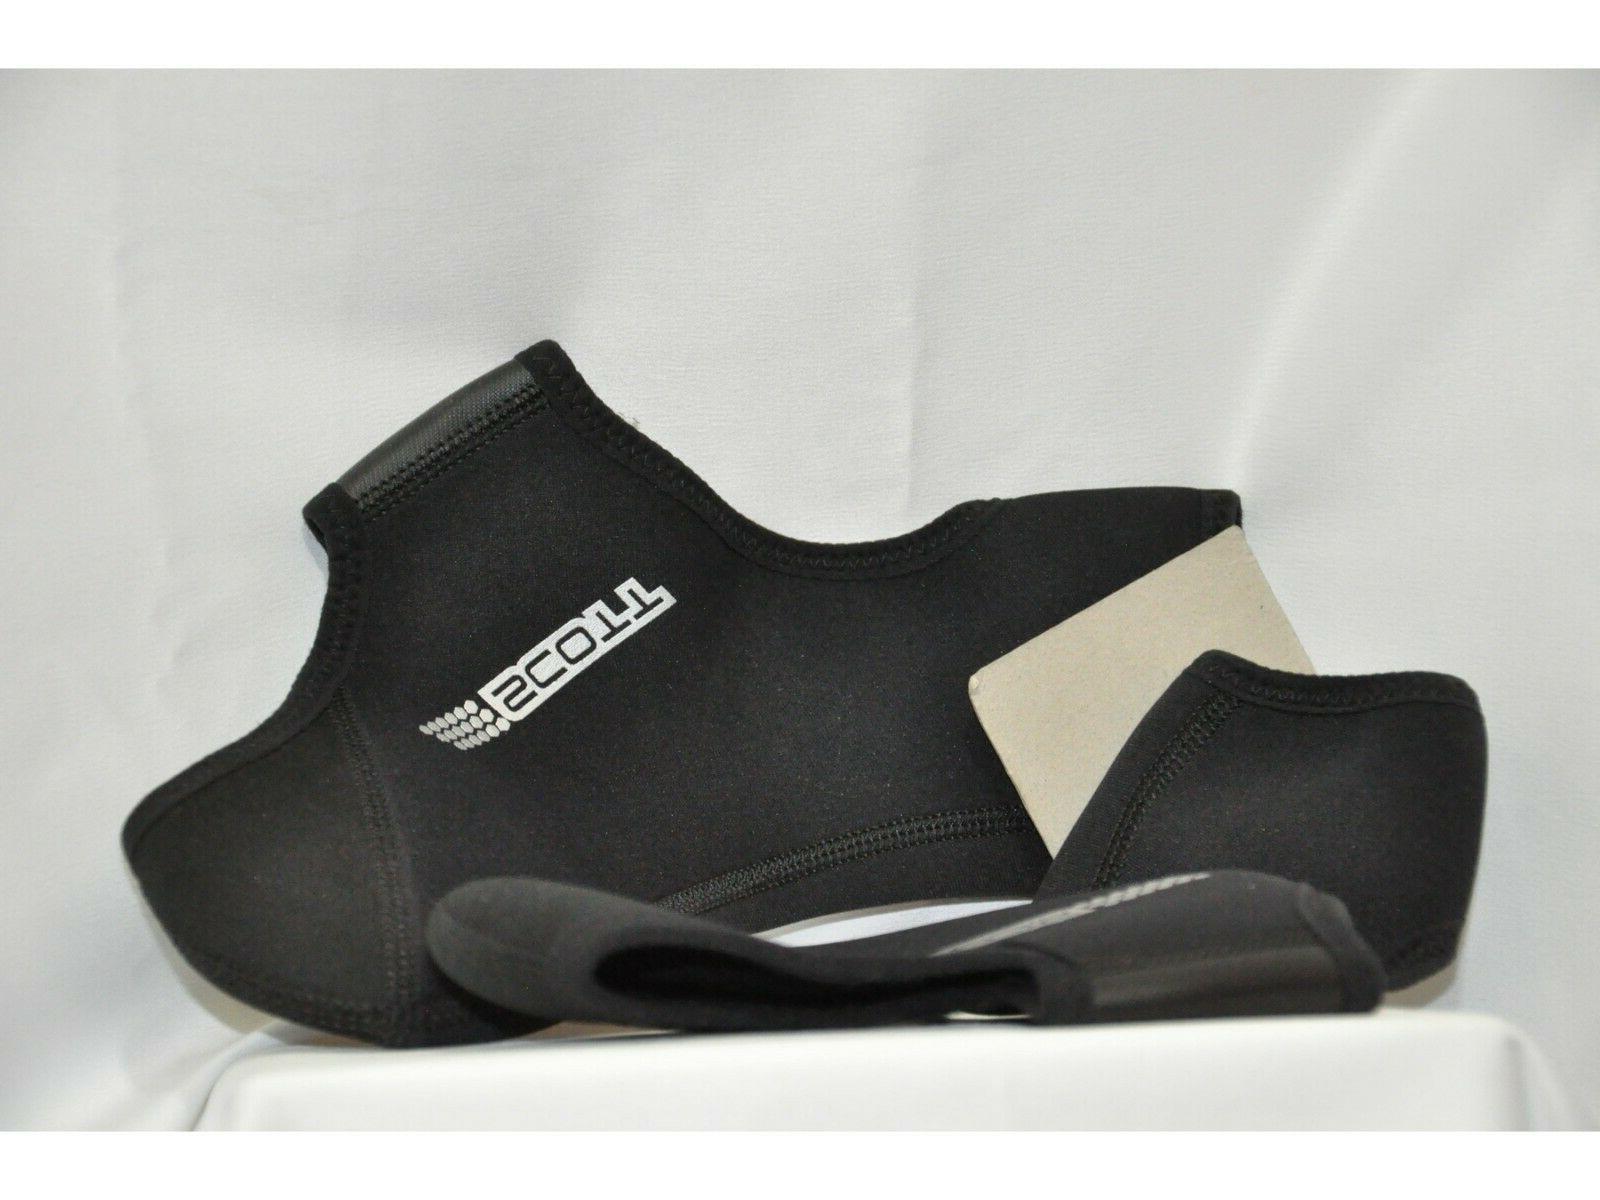 sports bicycle winter leg shoe covers black